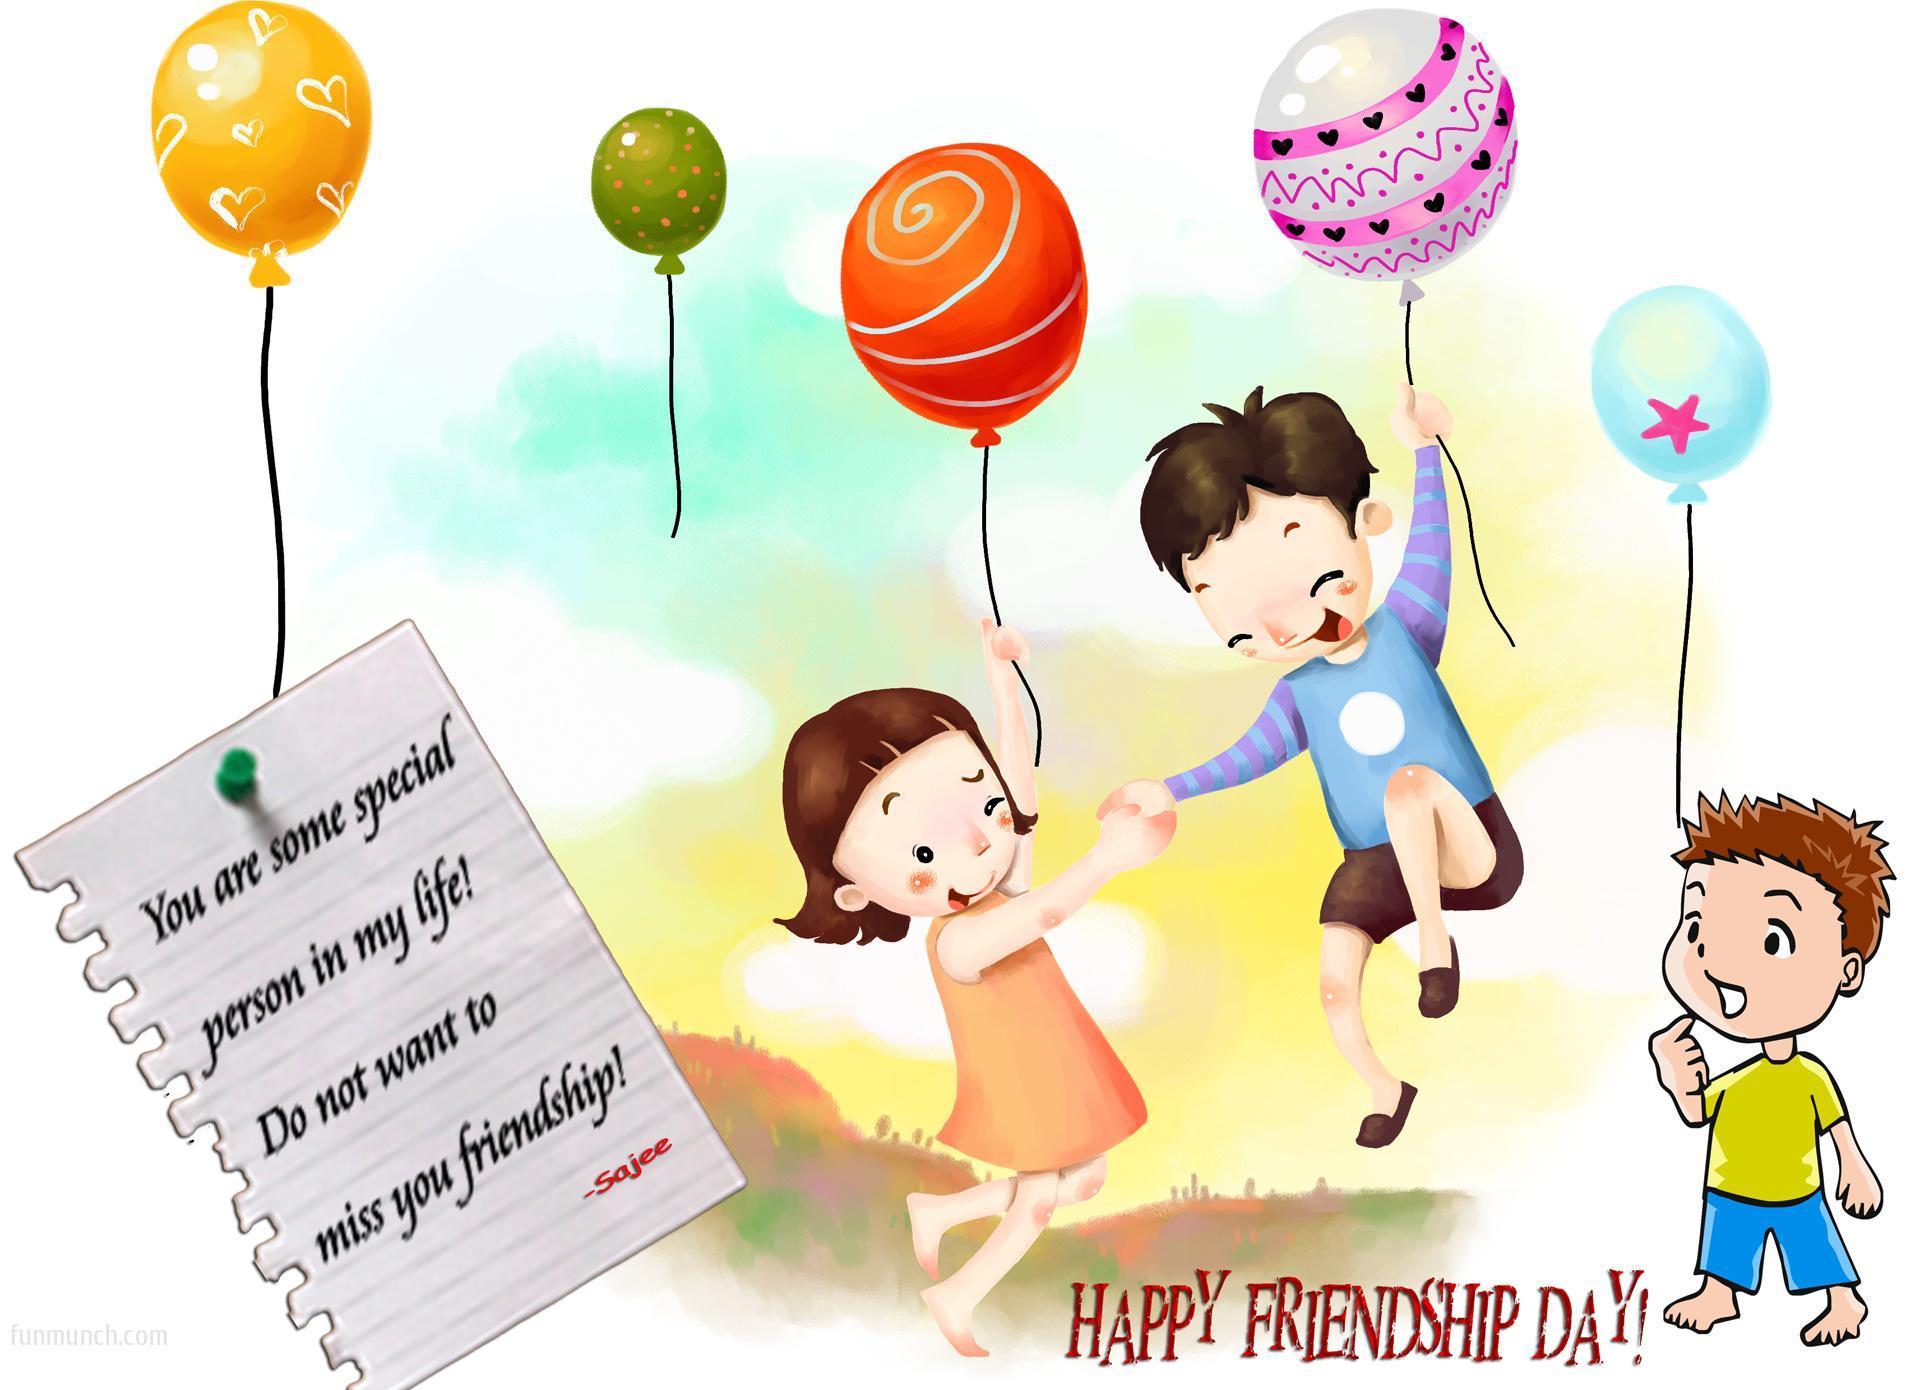 Happy Friendship Day Cartoon - Happy Friendship Day Cartoon